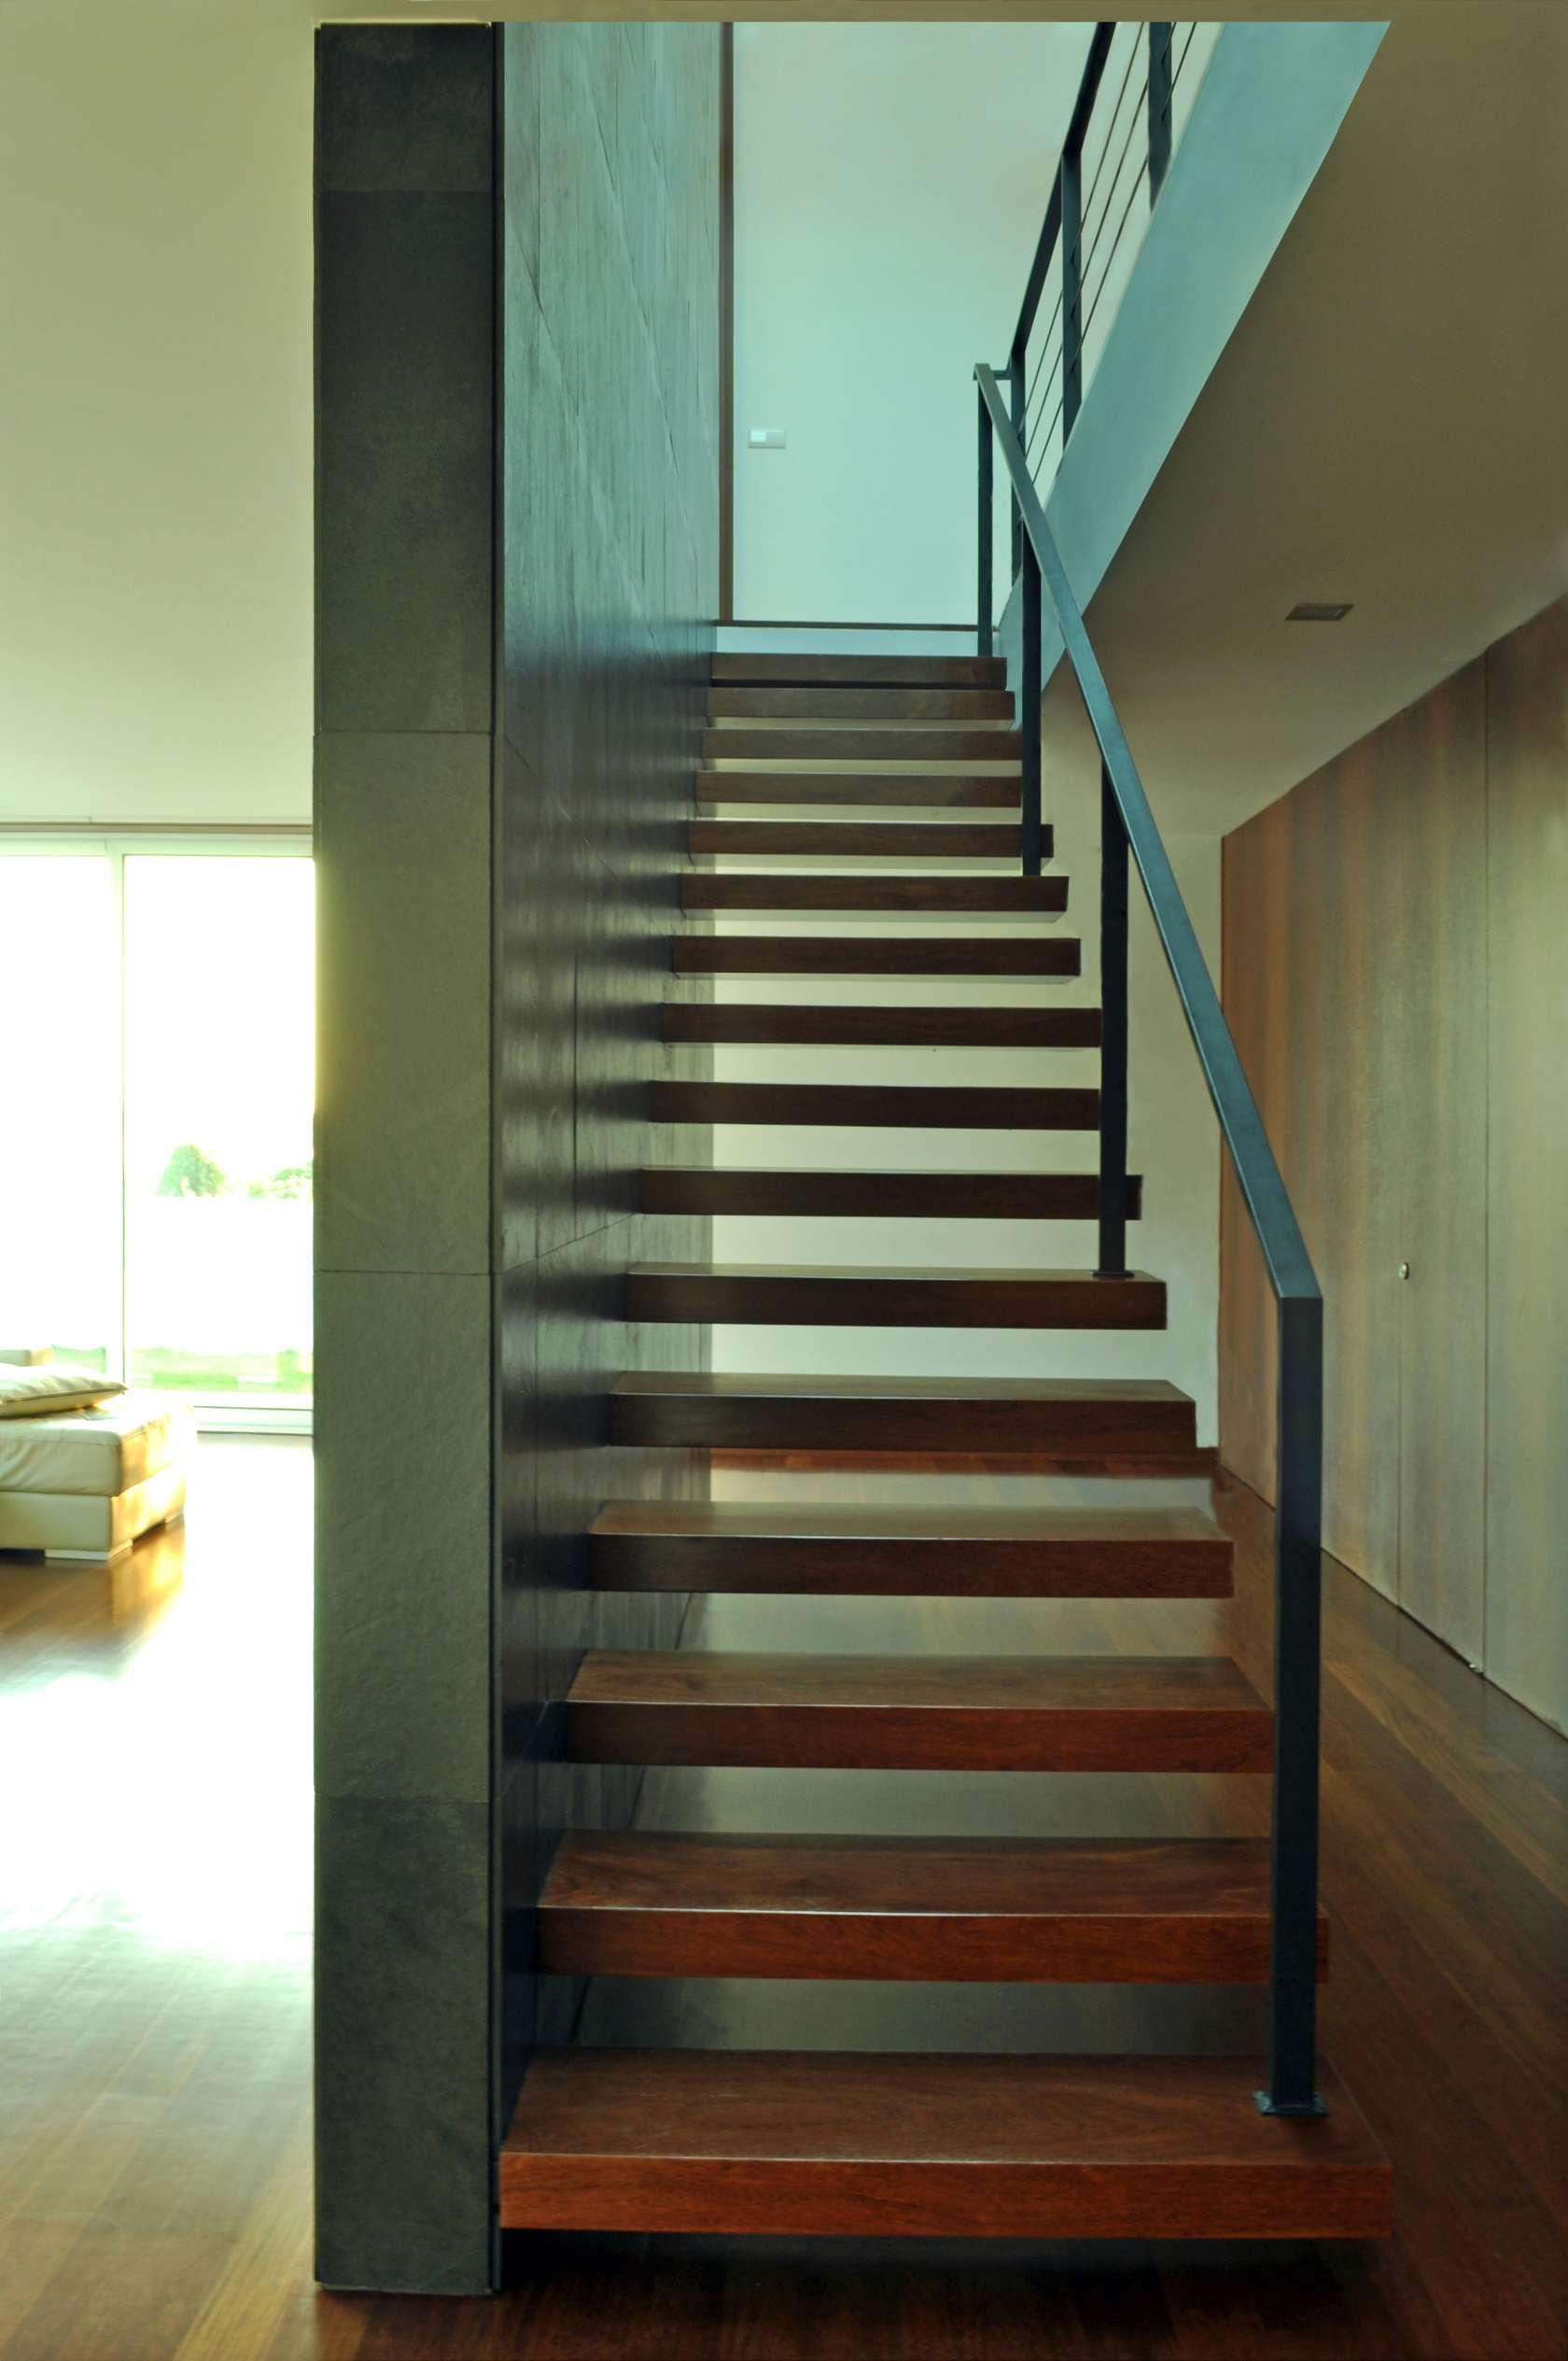 Dise o de casa cuadrada de dos pisos con planos y fachadas - Disenos de escaleras para casas ...